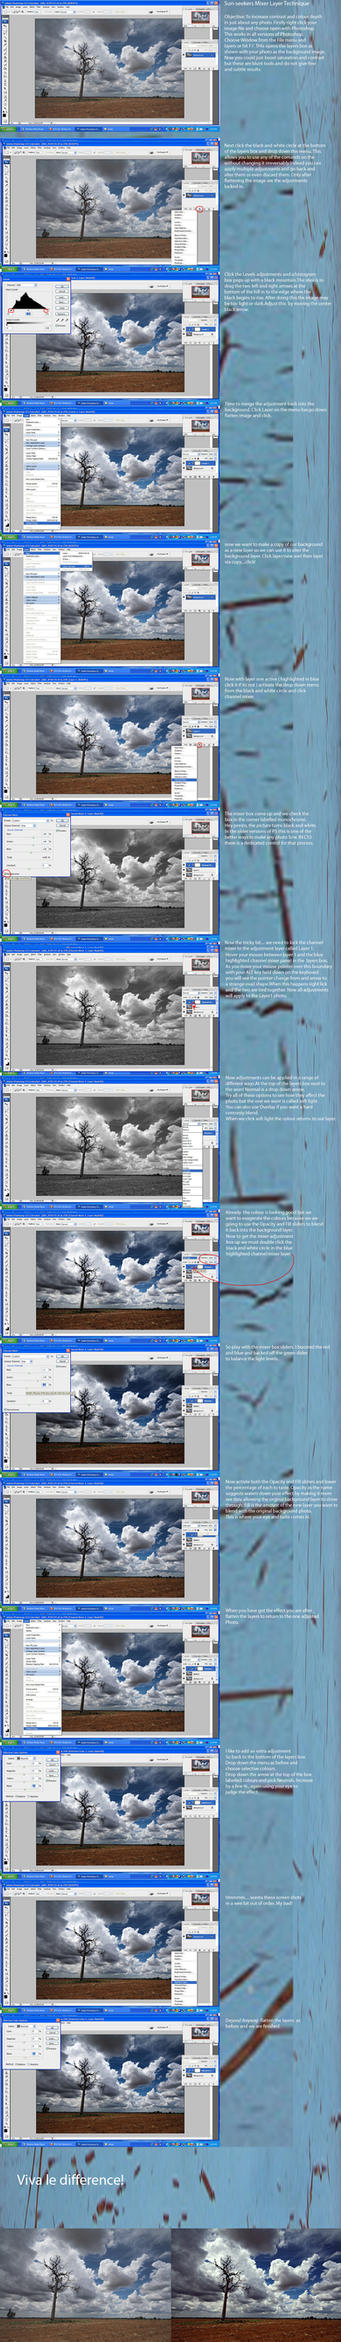 Photoshop Layer adjust Tute by Sun-Seeker